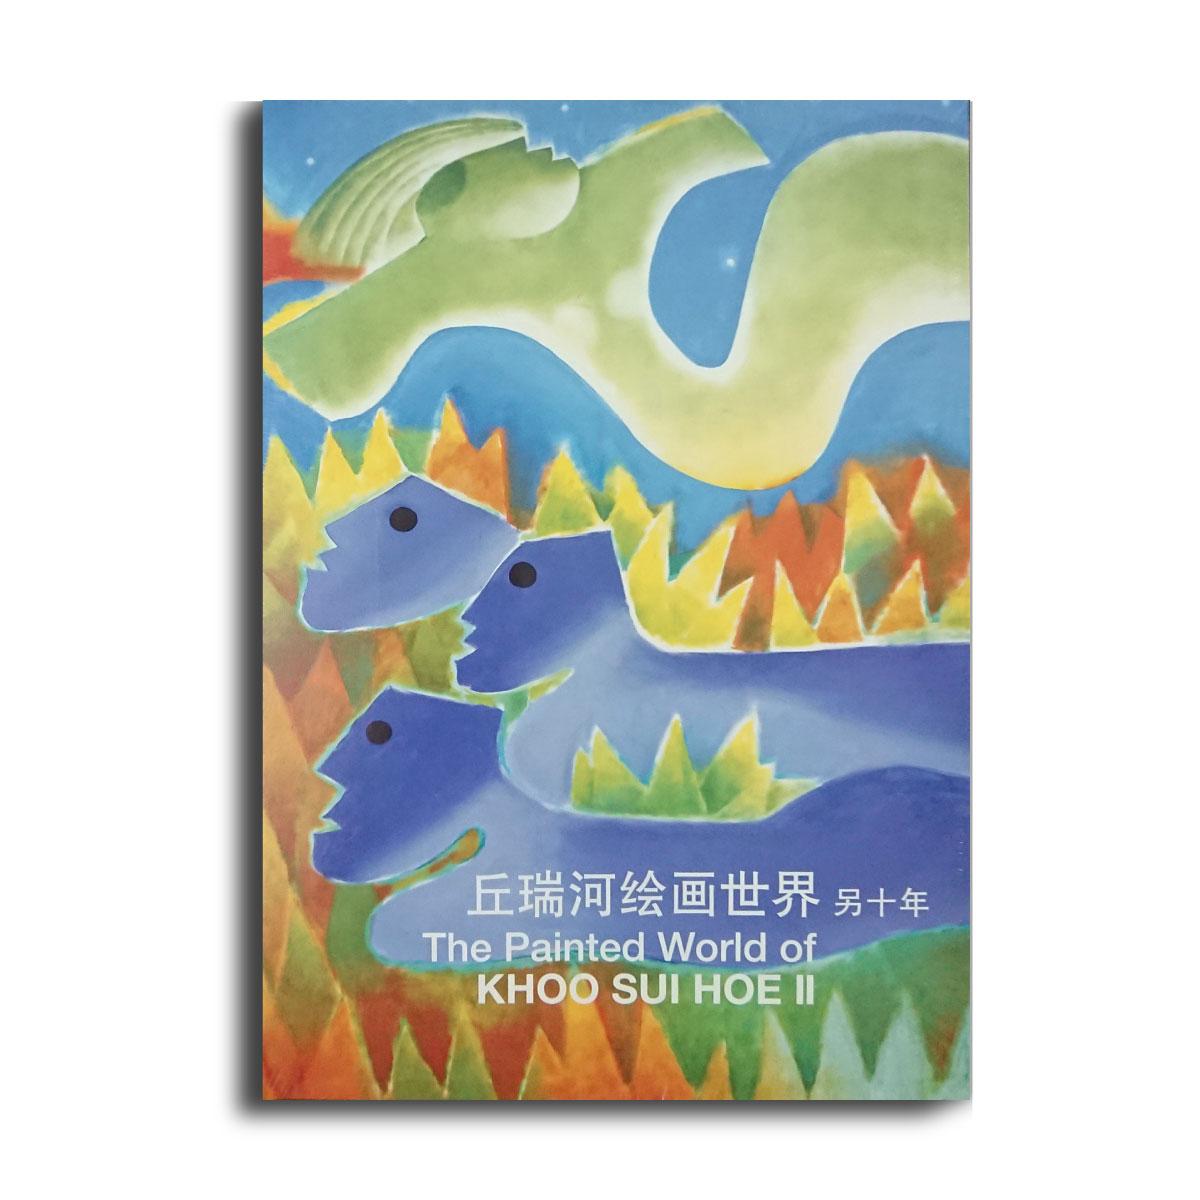 The Painted World of Khoo Sui Hoe II 【丘瑞河绘画世界另十年】